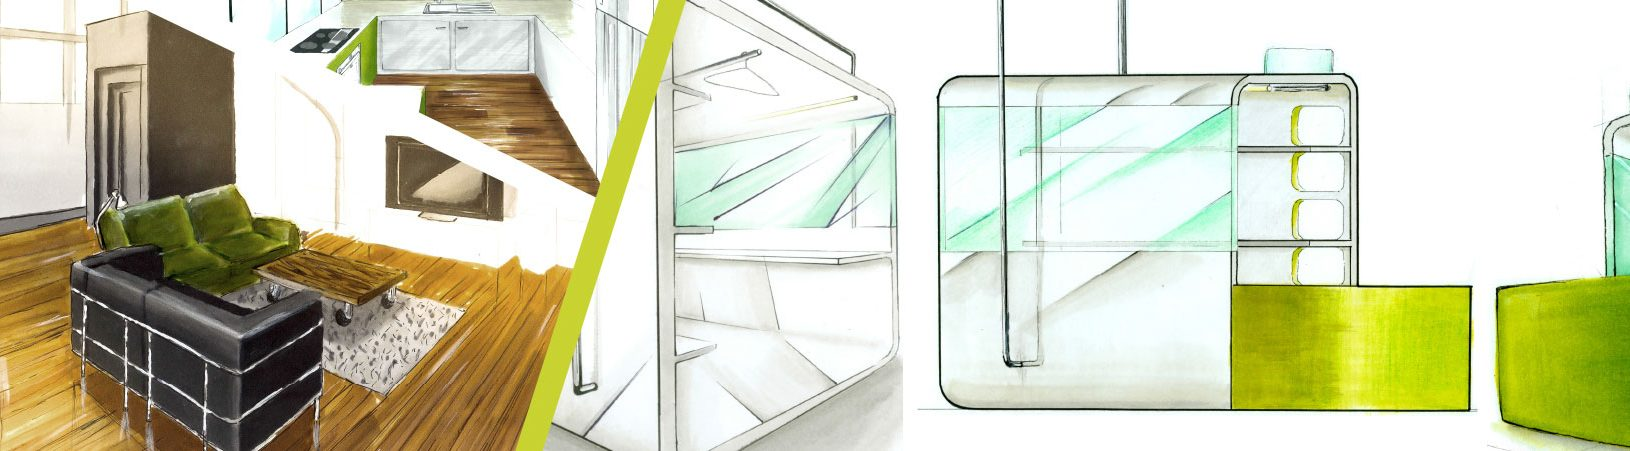 formation alternance bts design produit - comart-design